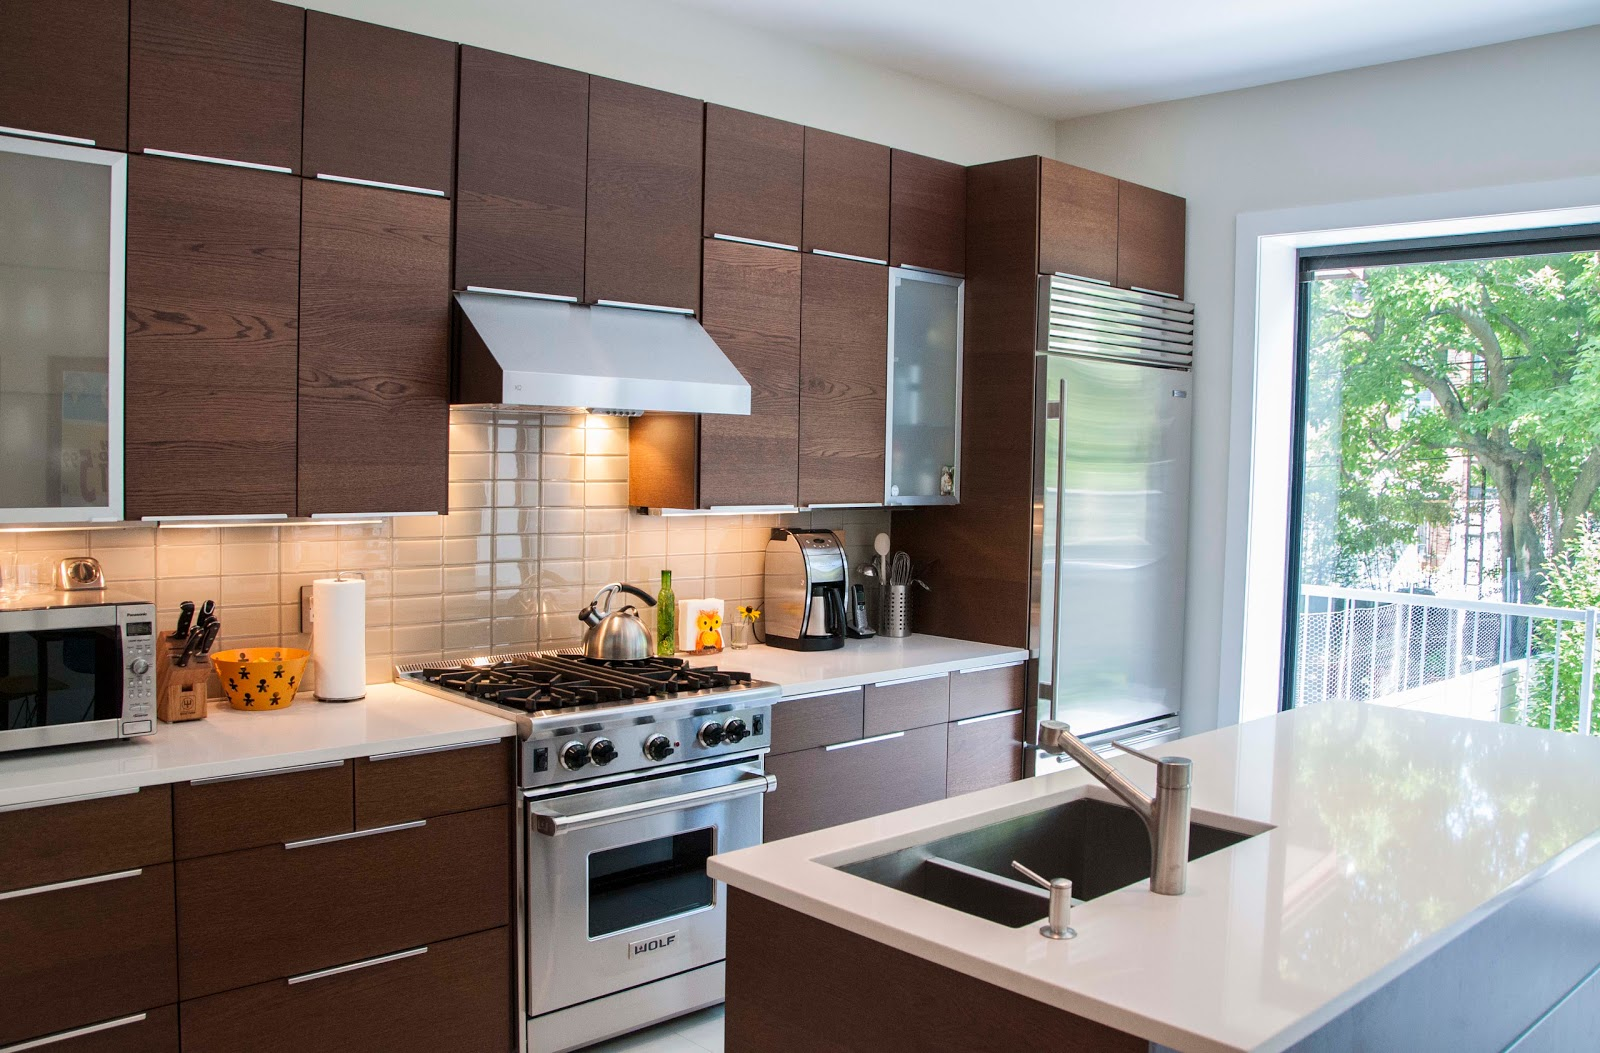 Kitchen countertop organization Photo - 7